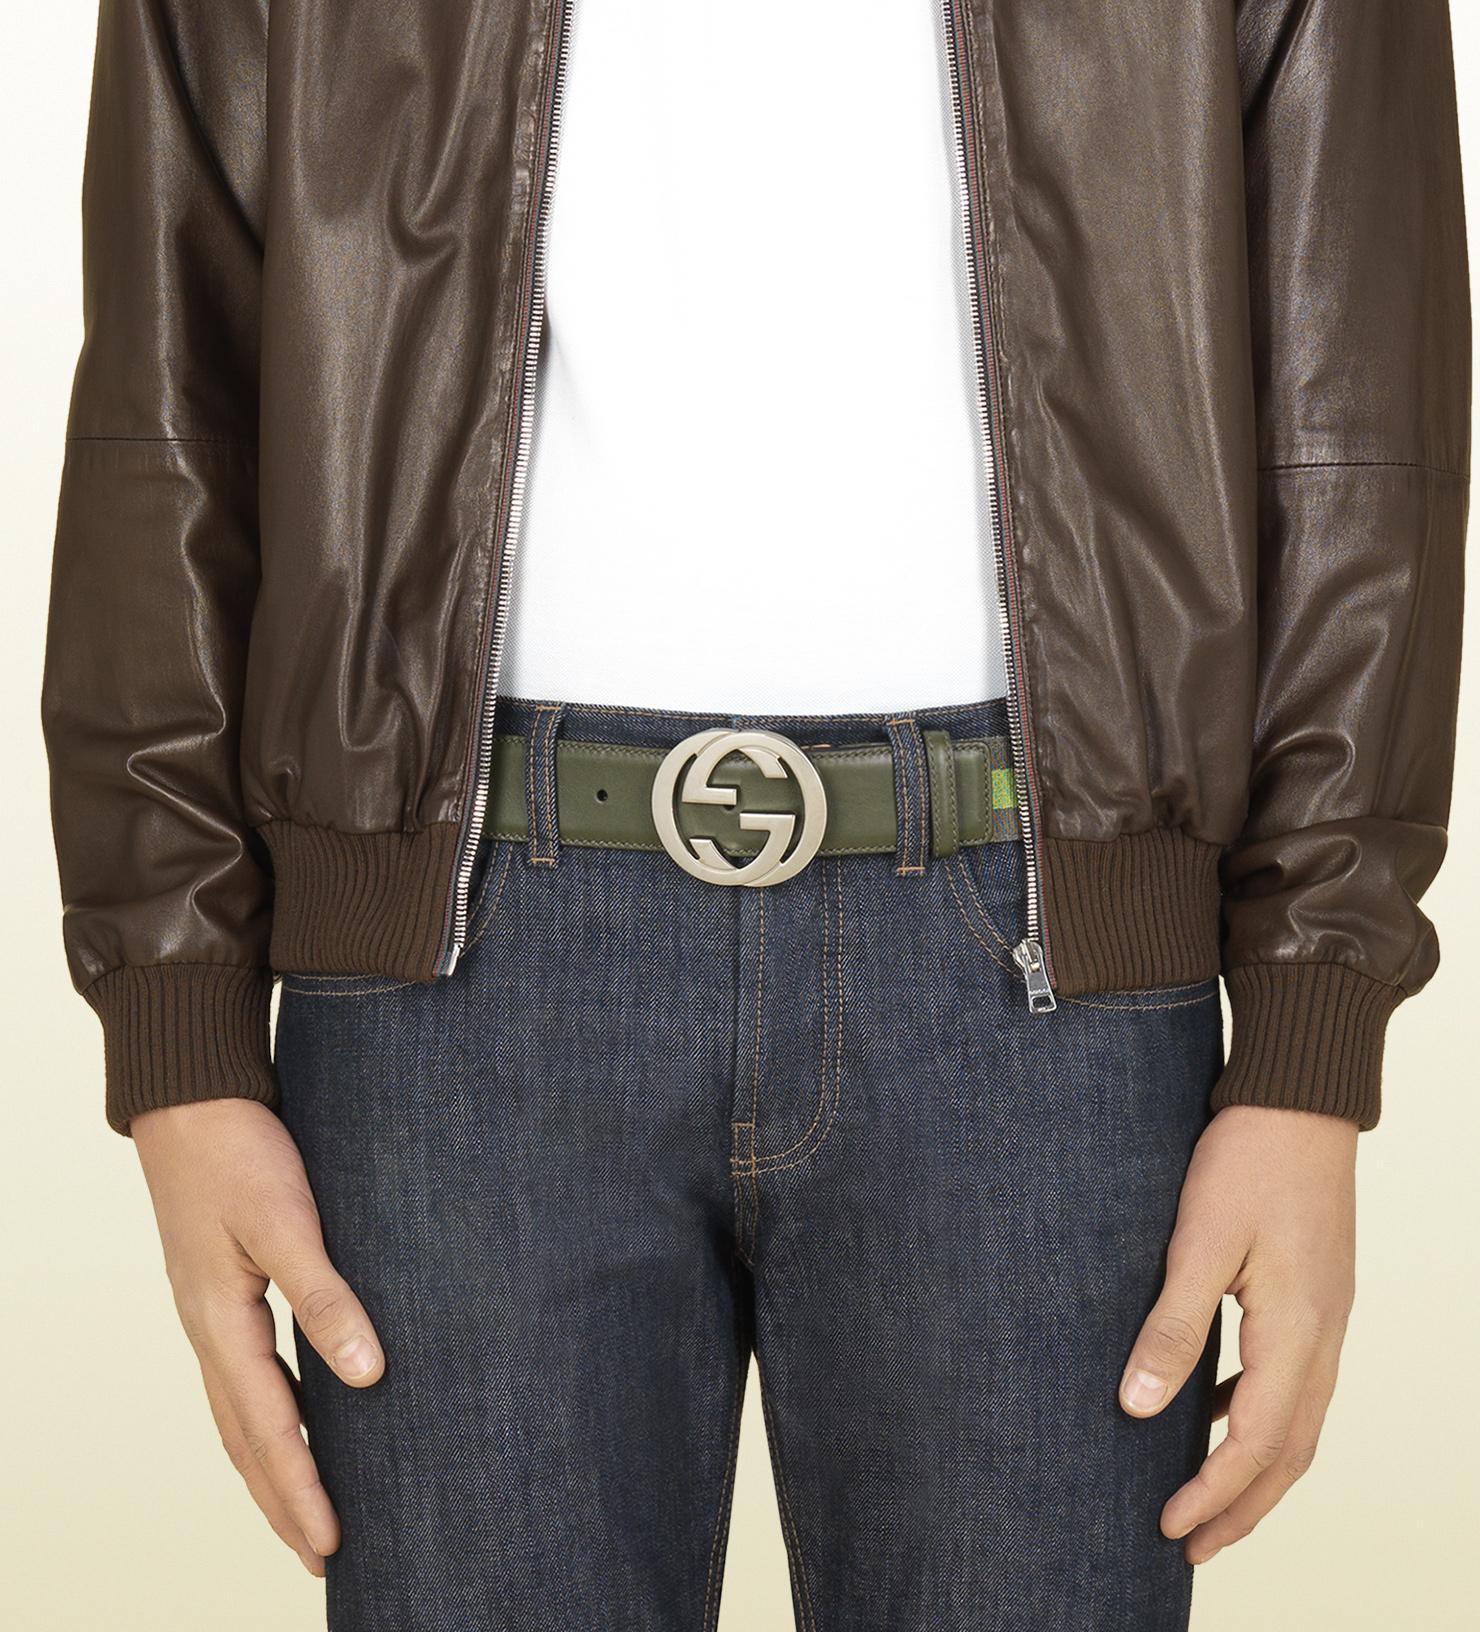 934dbdb5aac Gucci Nylon Web Belt with Interlocking G Buckle in Green for Men - Lyst